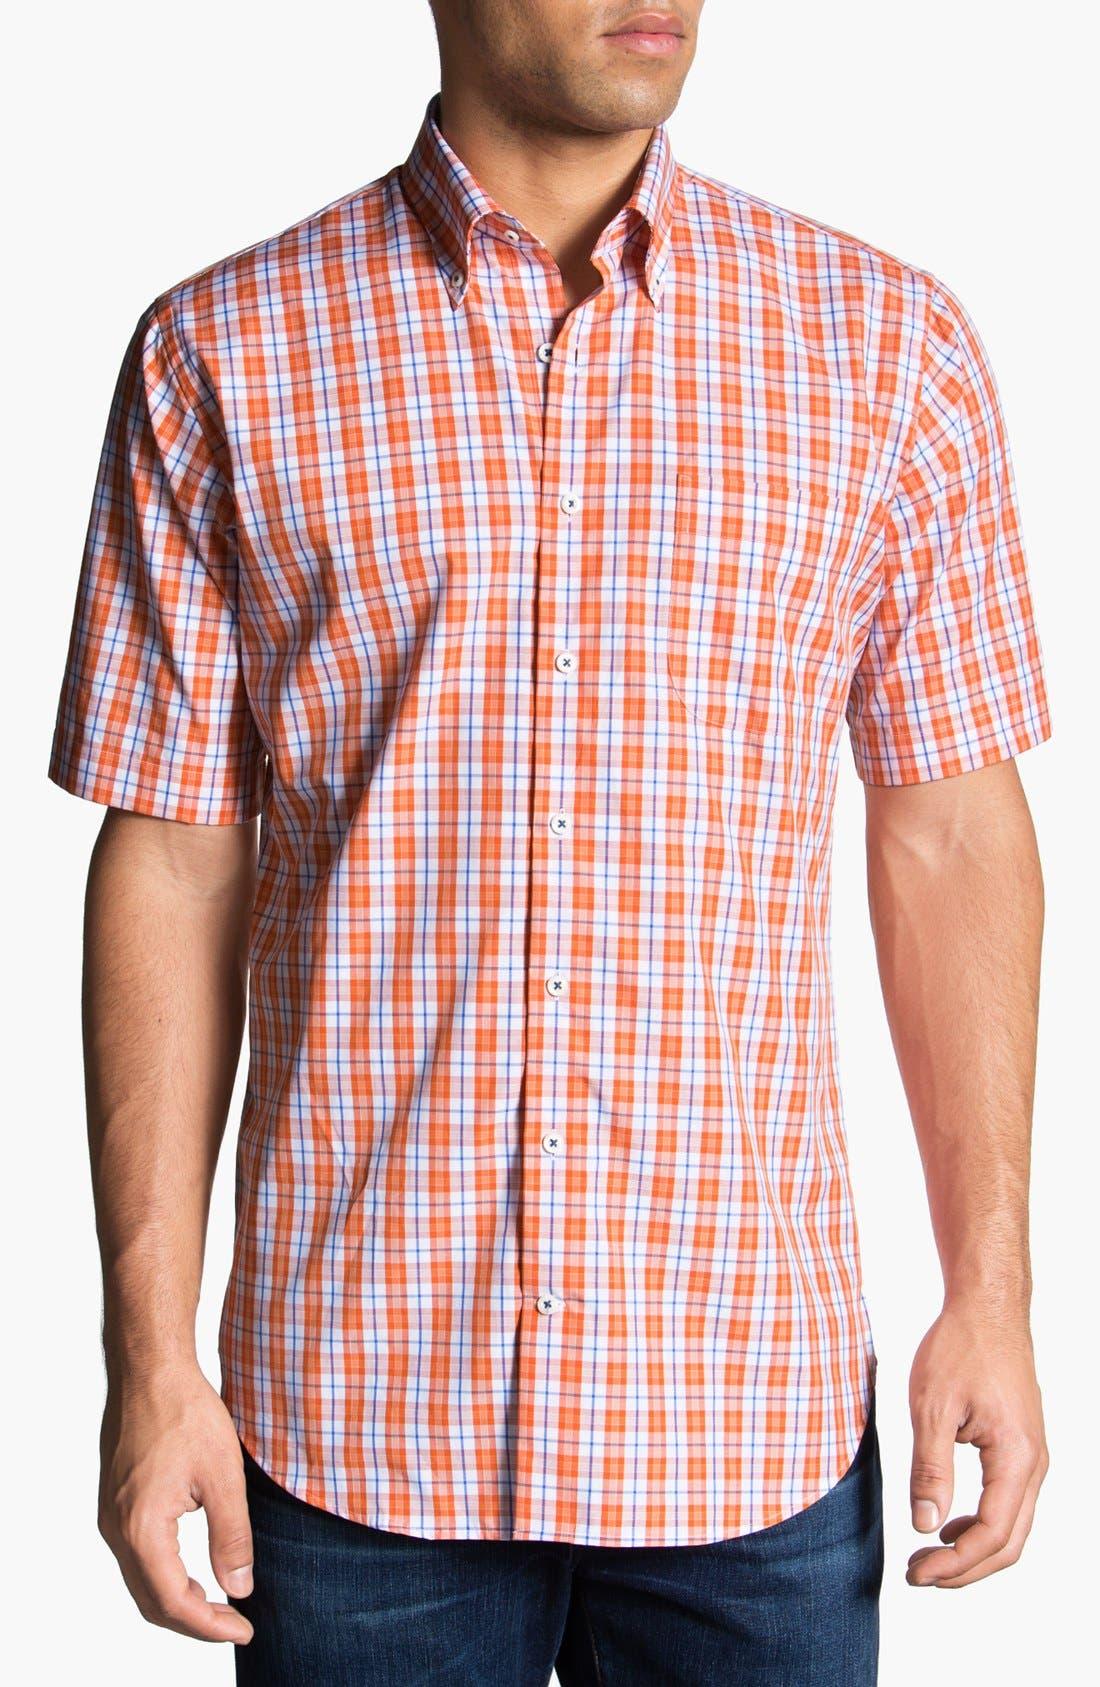 Alternate Image 1 Selected - Peter Millar 'Copenhagen' Regular Fit Check Sport Shirt.